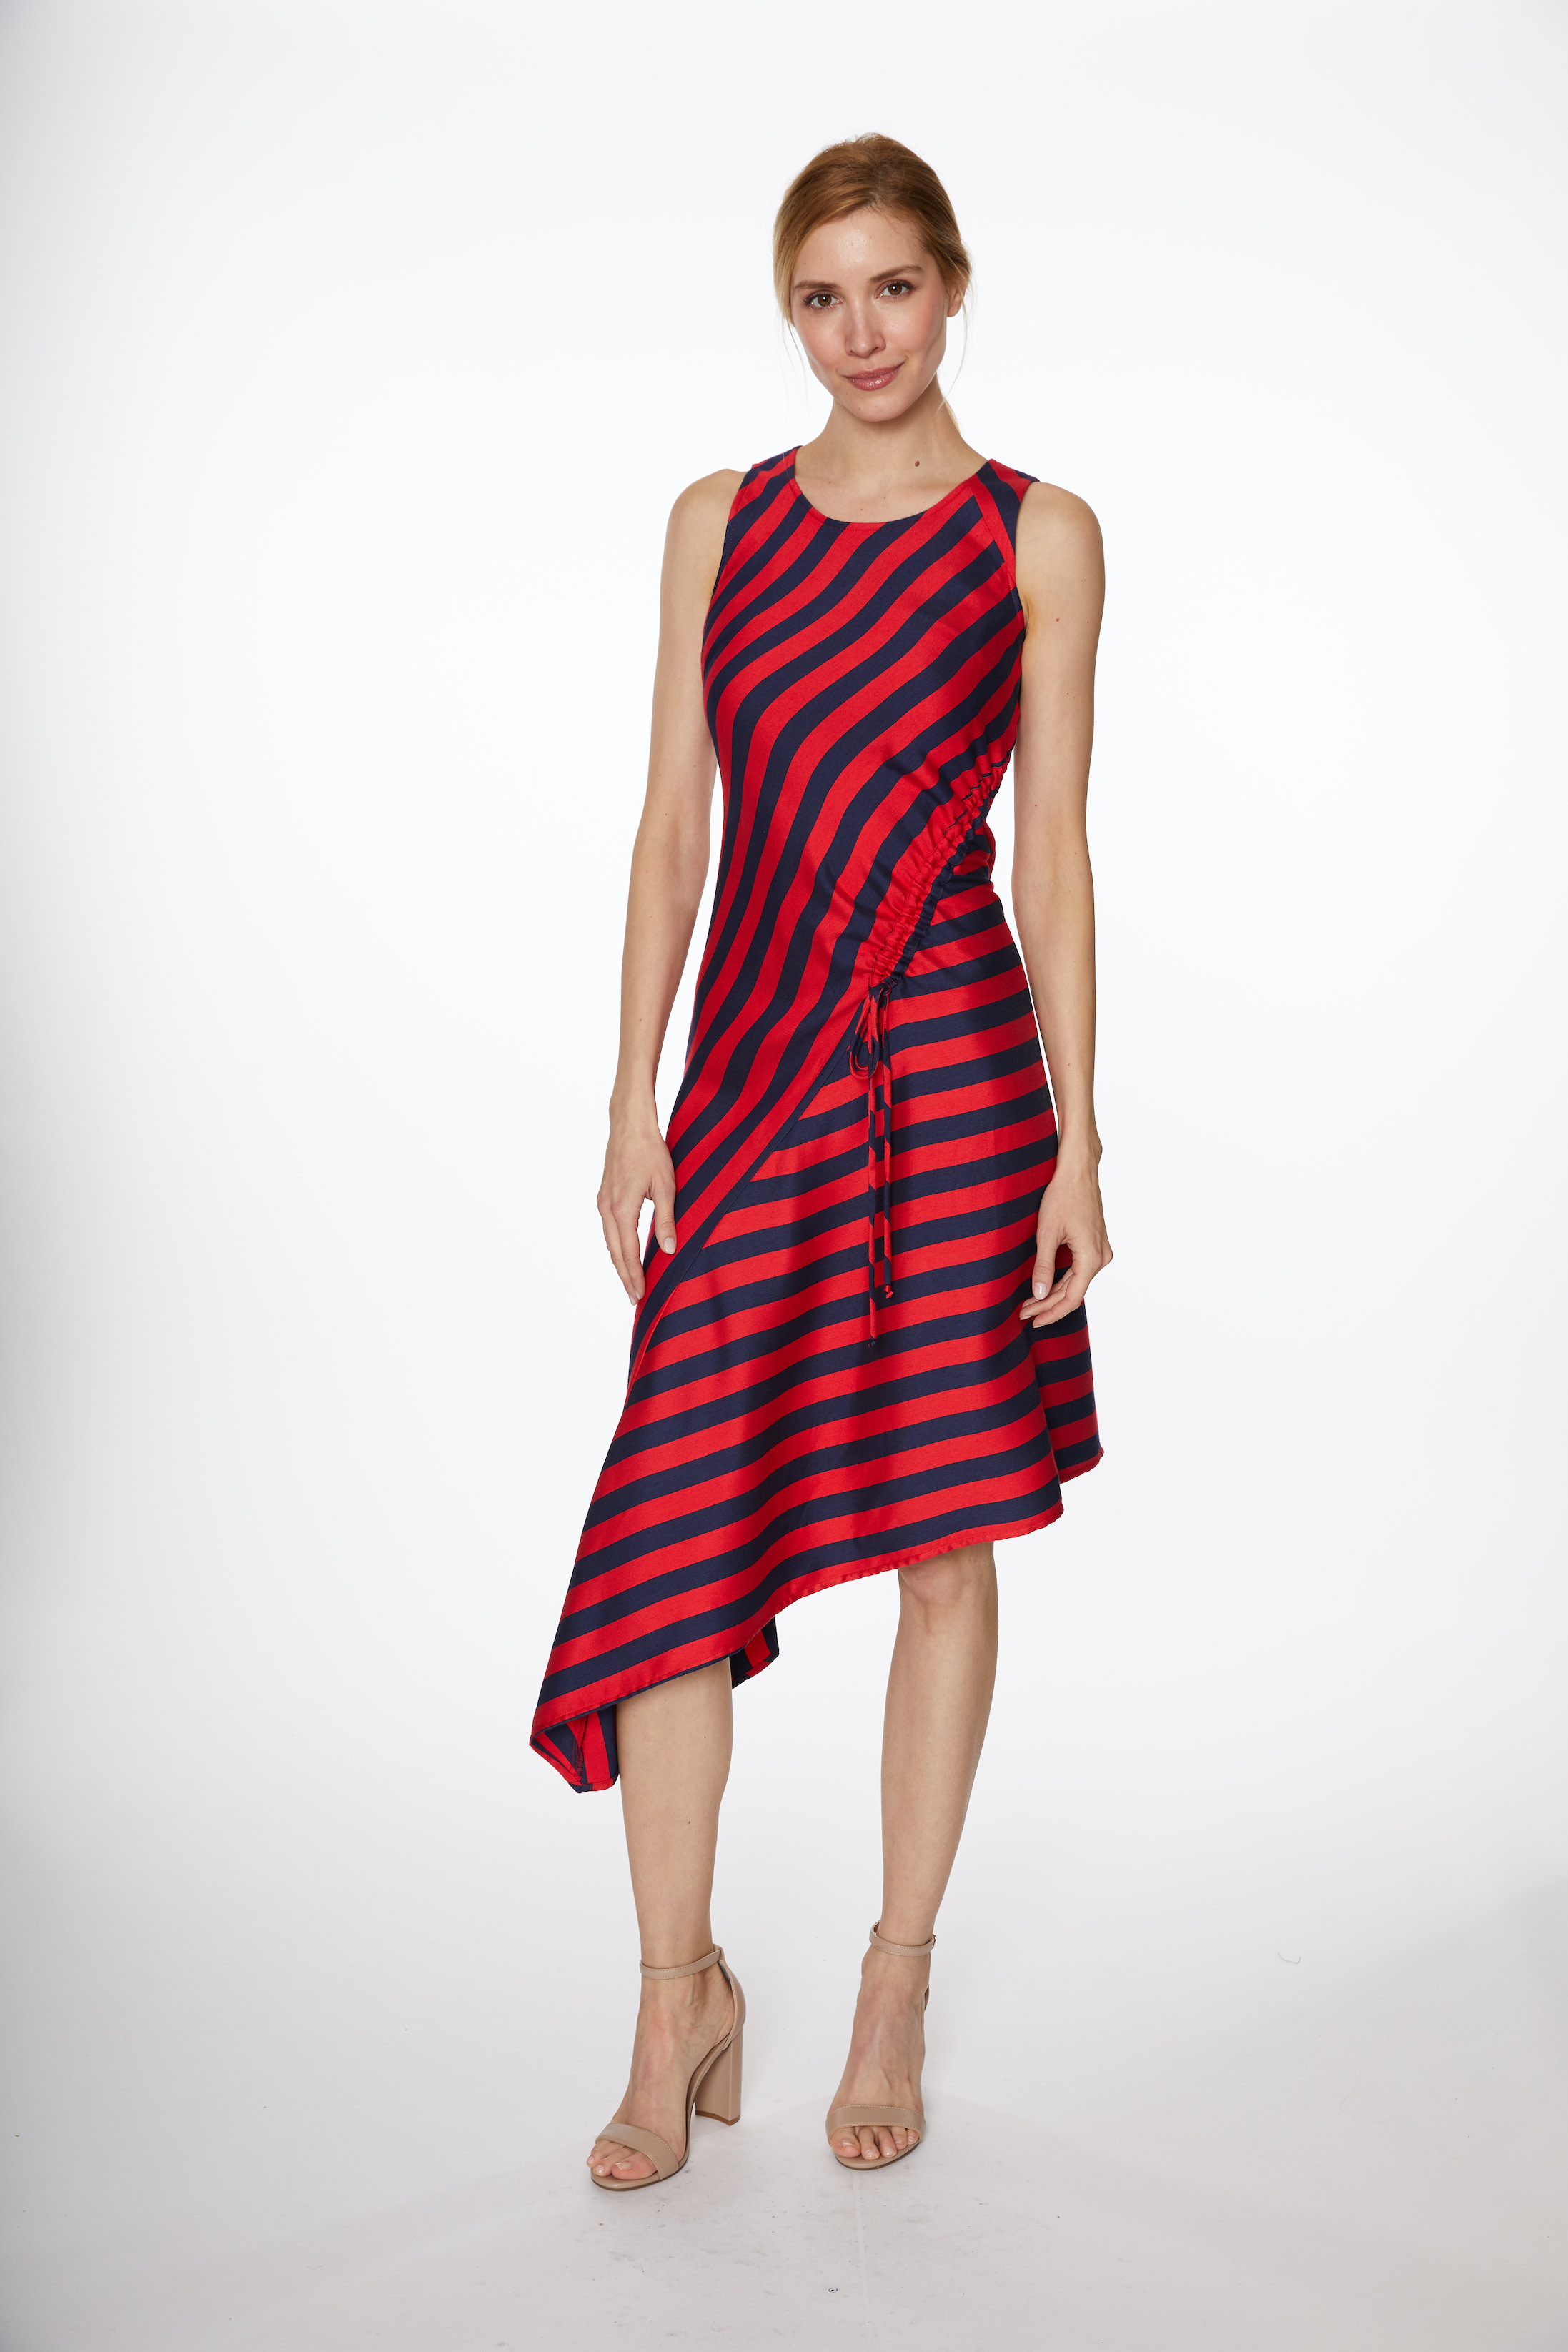 Asymmetrical Stripe Drawstring Dress - Navy/Red - Front